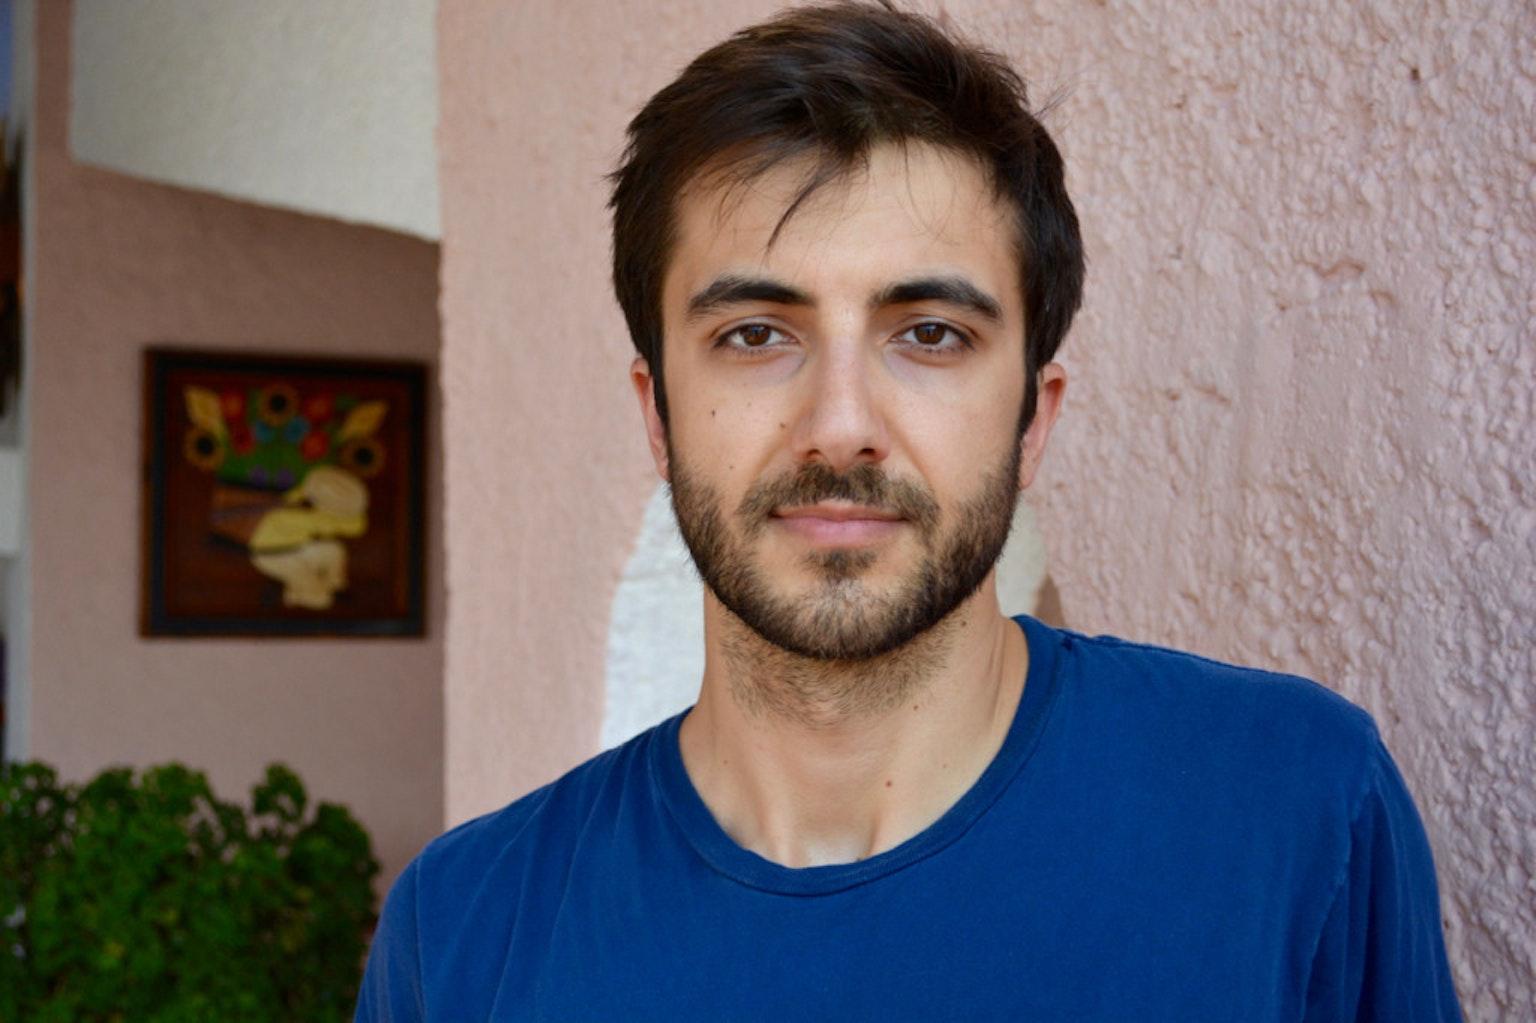 Nick Antosca on adapting creepypastas for his Syfy anthology series 'Channel Zero'.